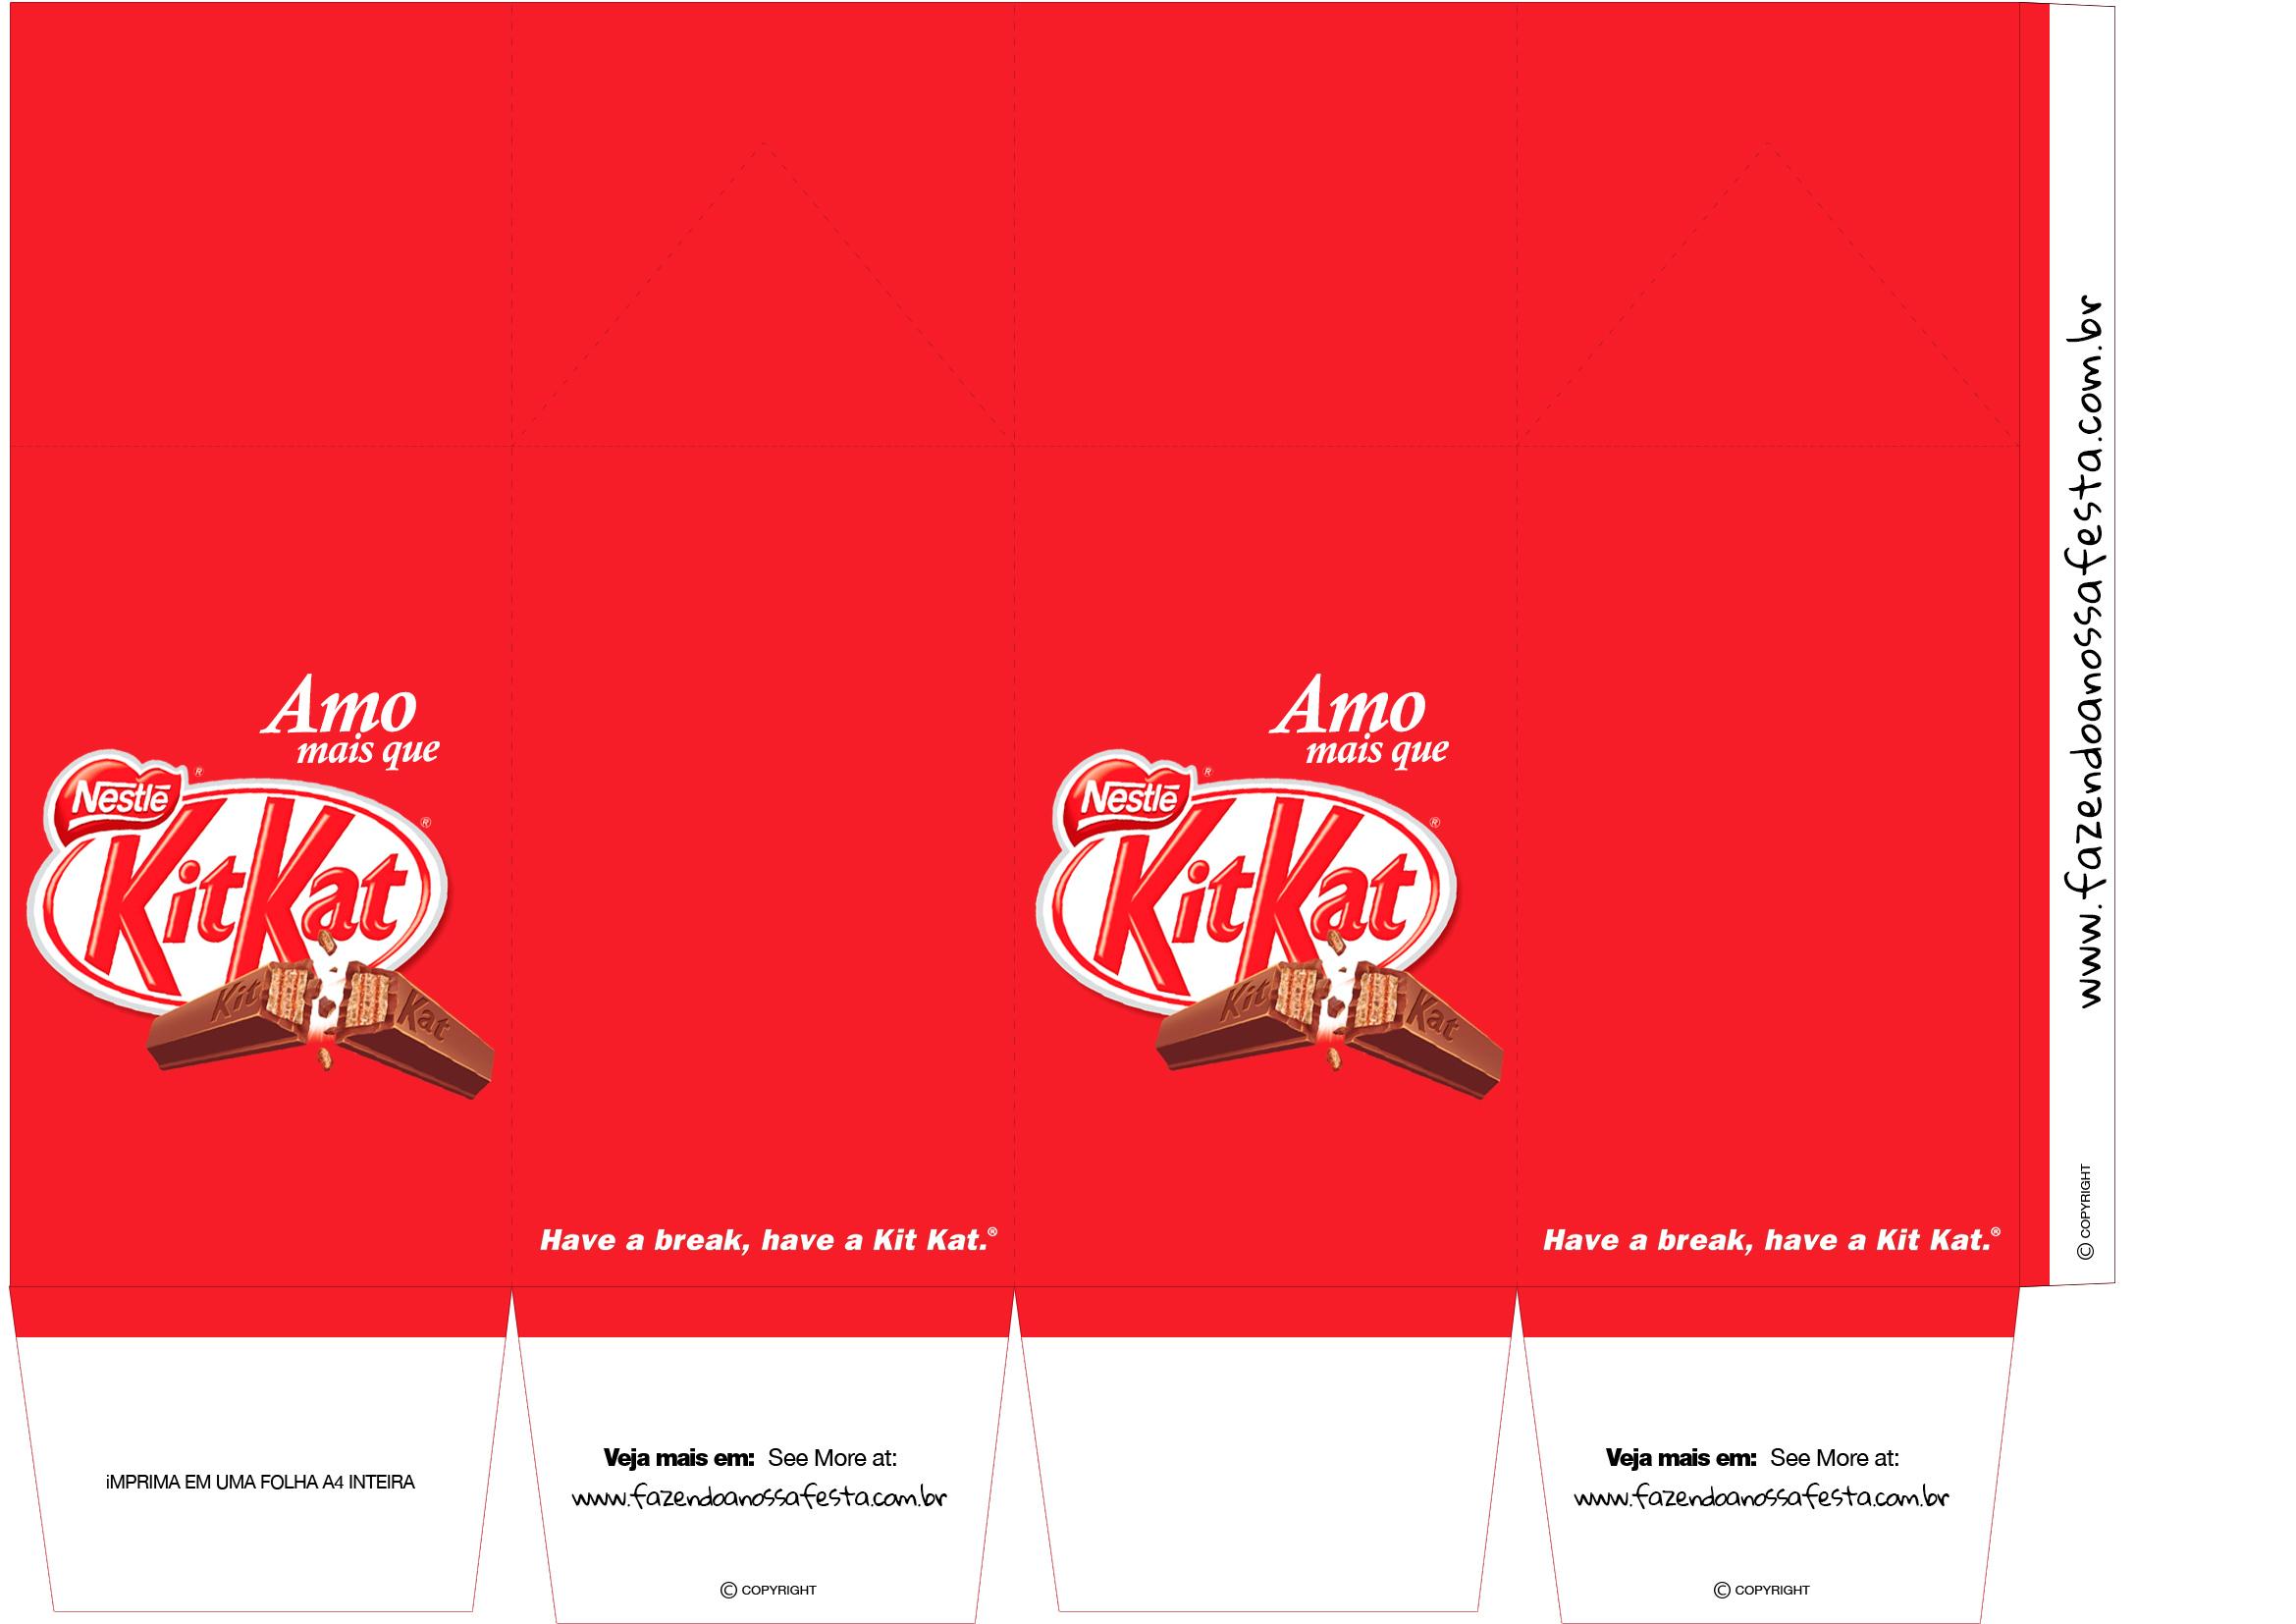 Caixa de Leite para Dia dos Namorados Kit Kat